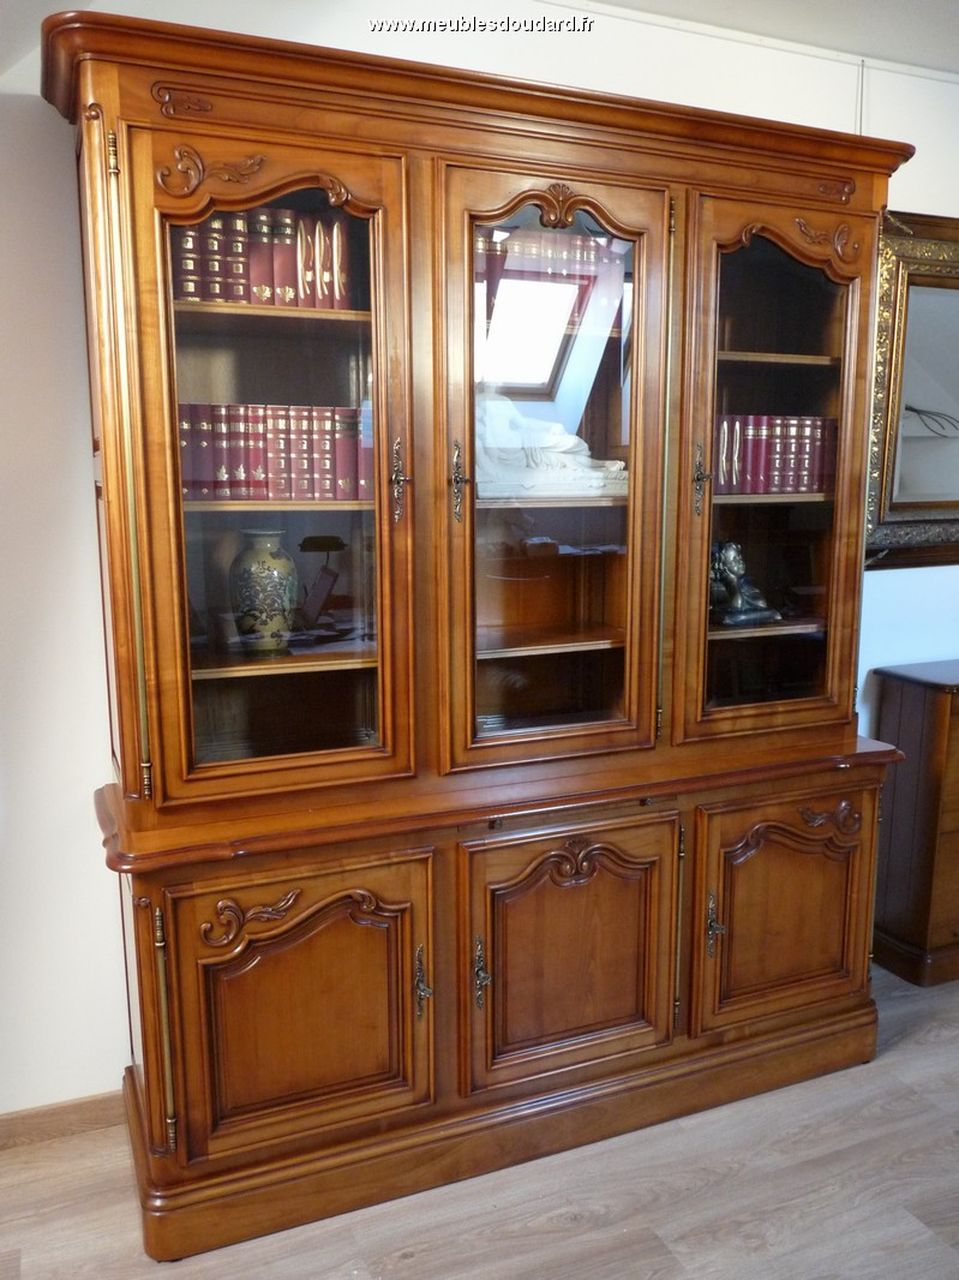 biblioth que merisier meuble biblioth que louis xv. Black Bedroom Furniture Sets. Home Design Ideas